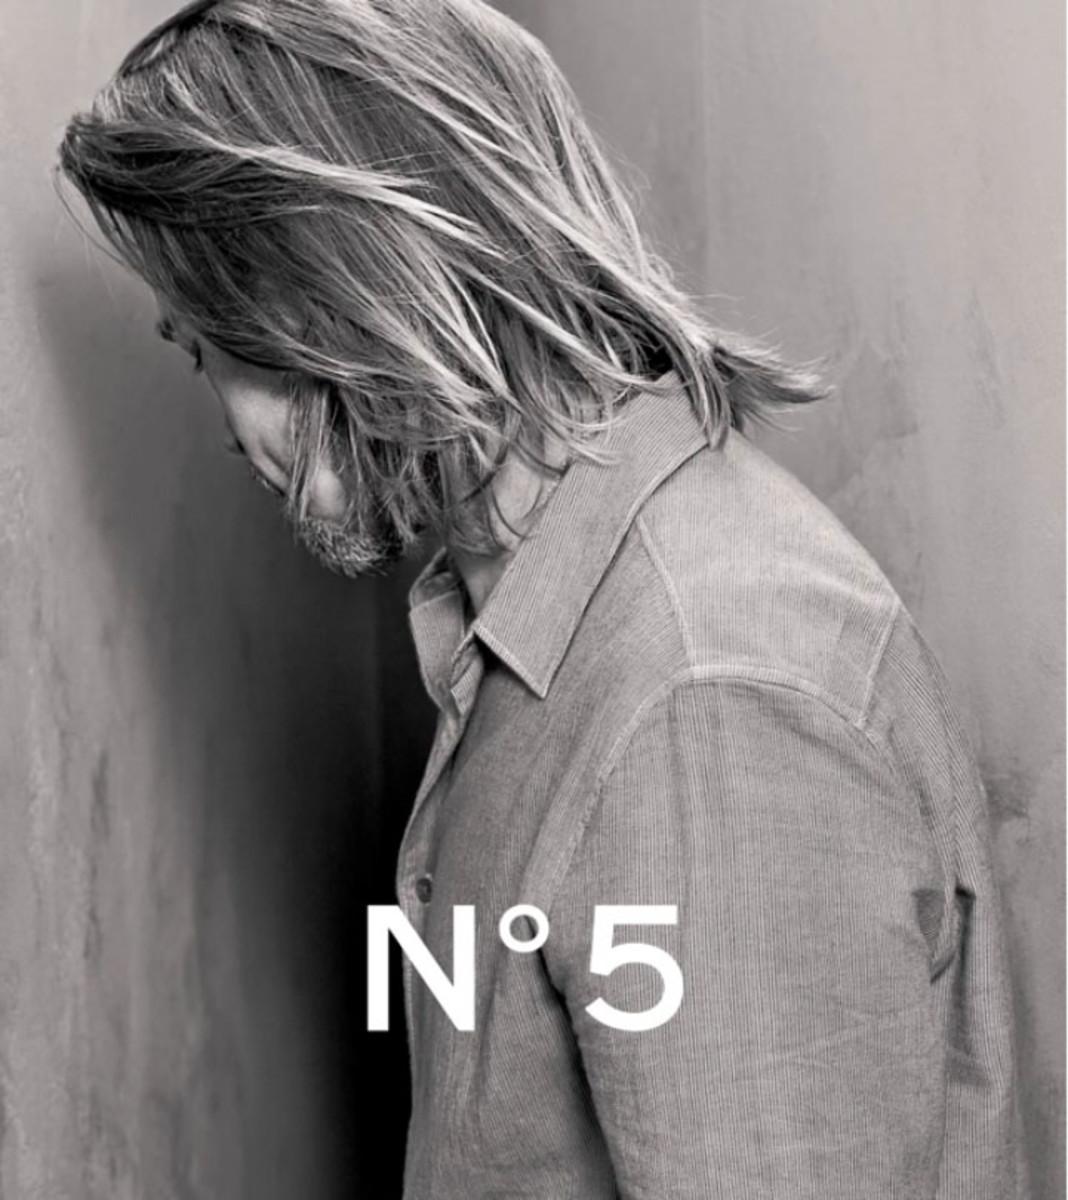 Brad Pitt_Chanel No 5 teaser photo